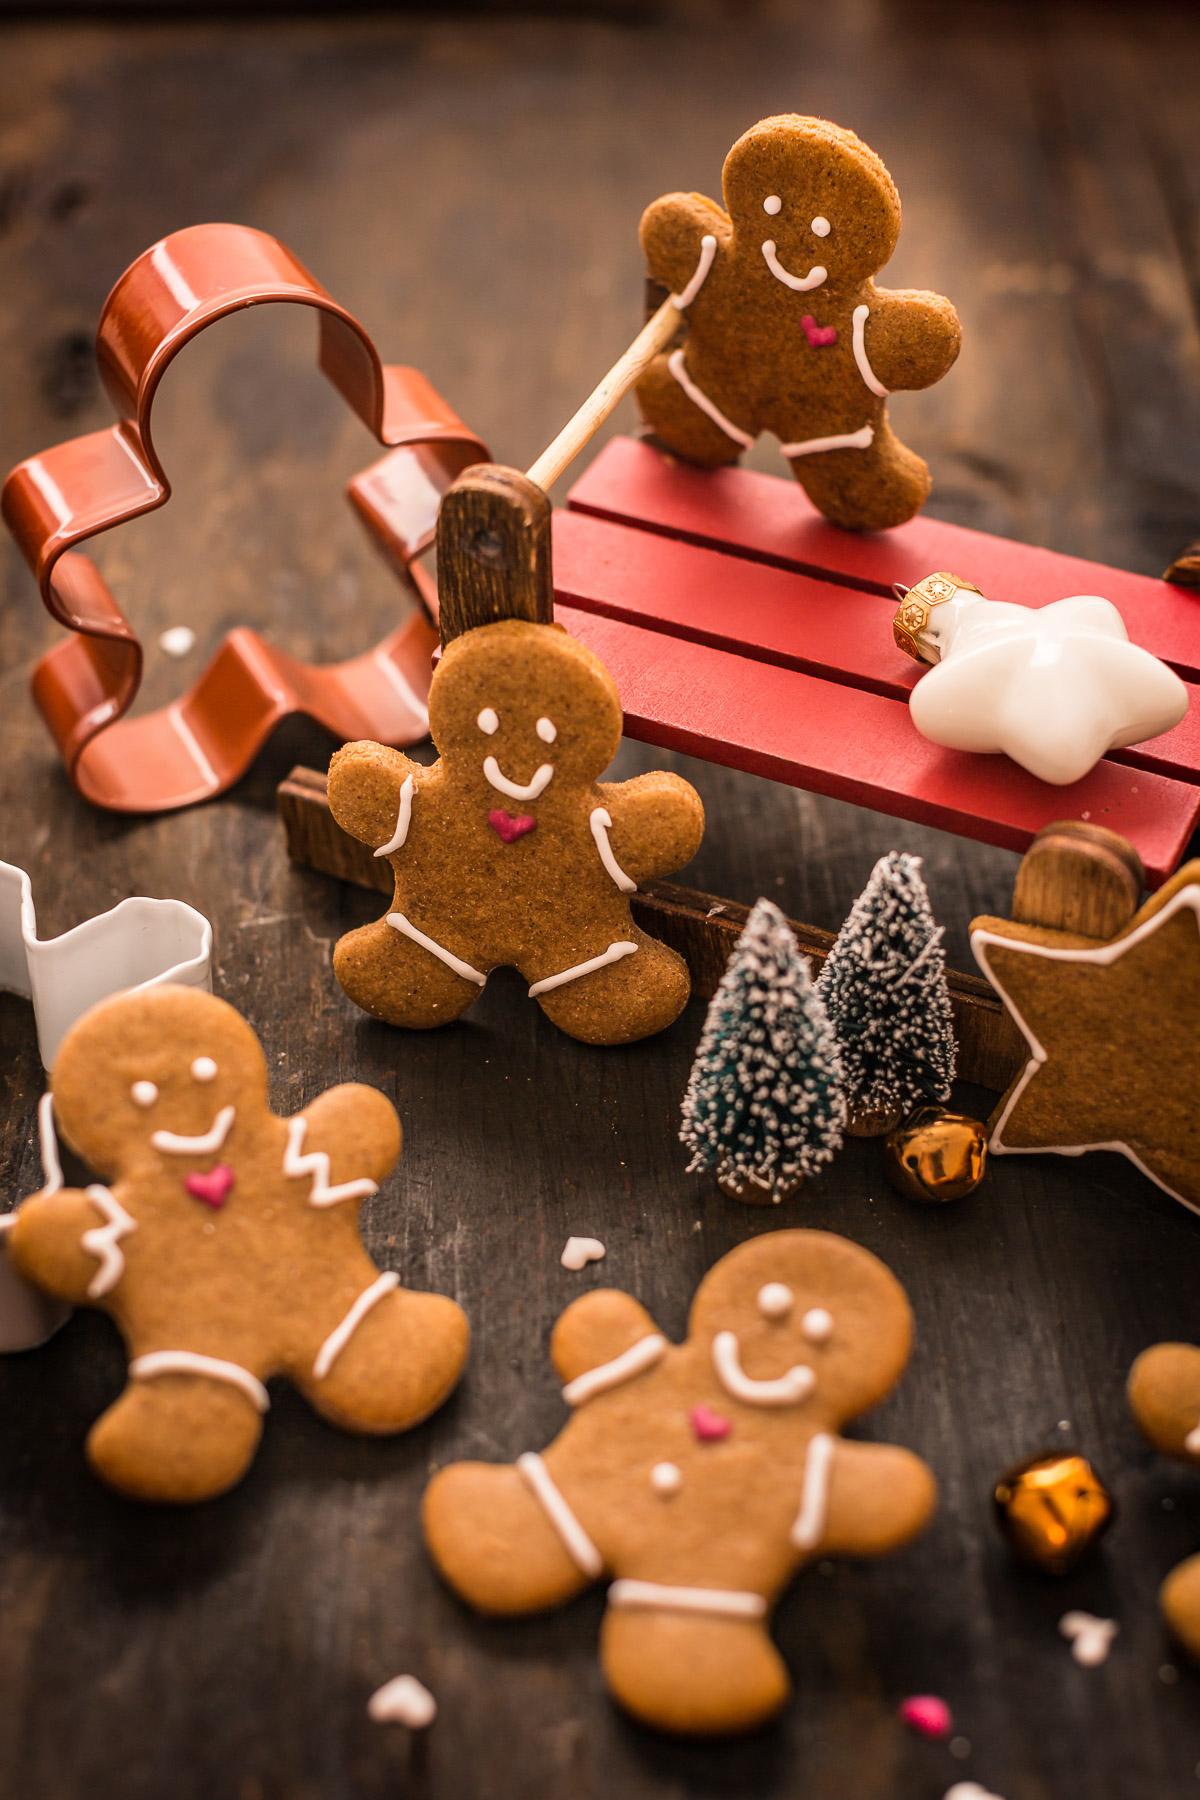 vegan gingerbread man vegani - ricetta biscotti pan di zenzero vegani croccanti leggeri friabili #vegan #gingerbread senza burro